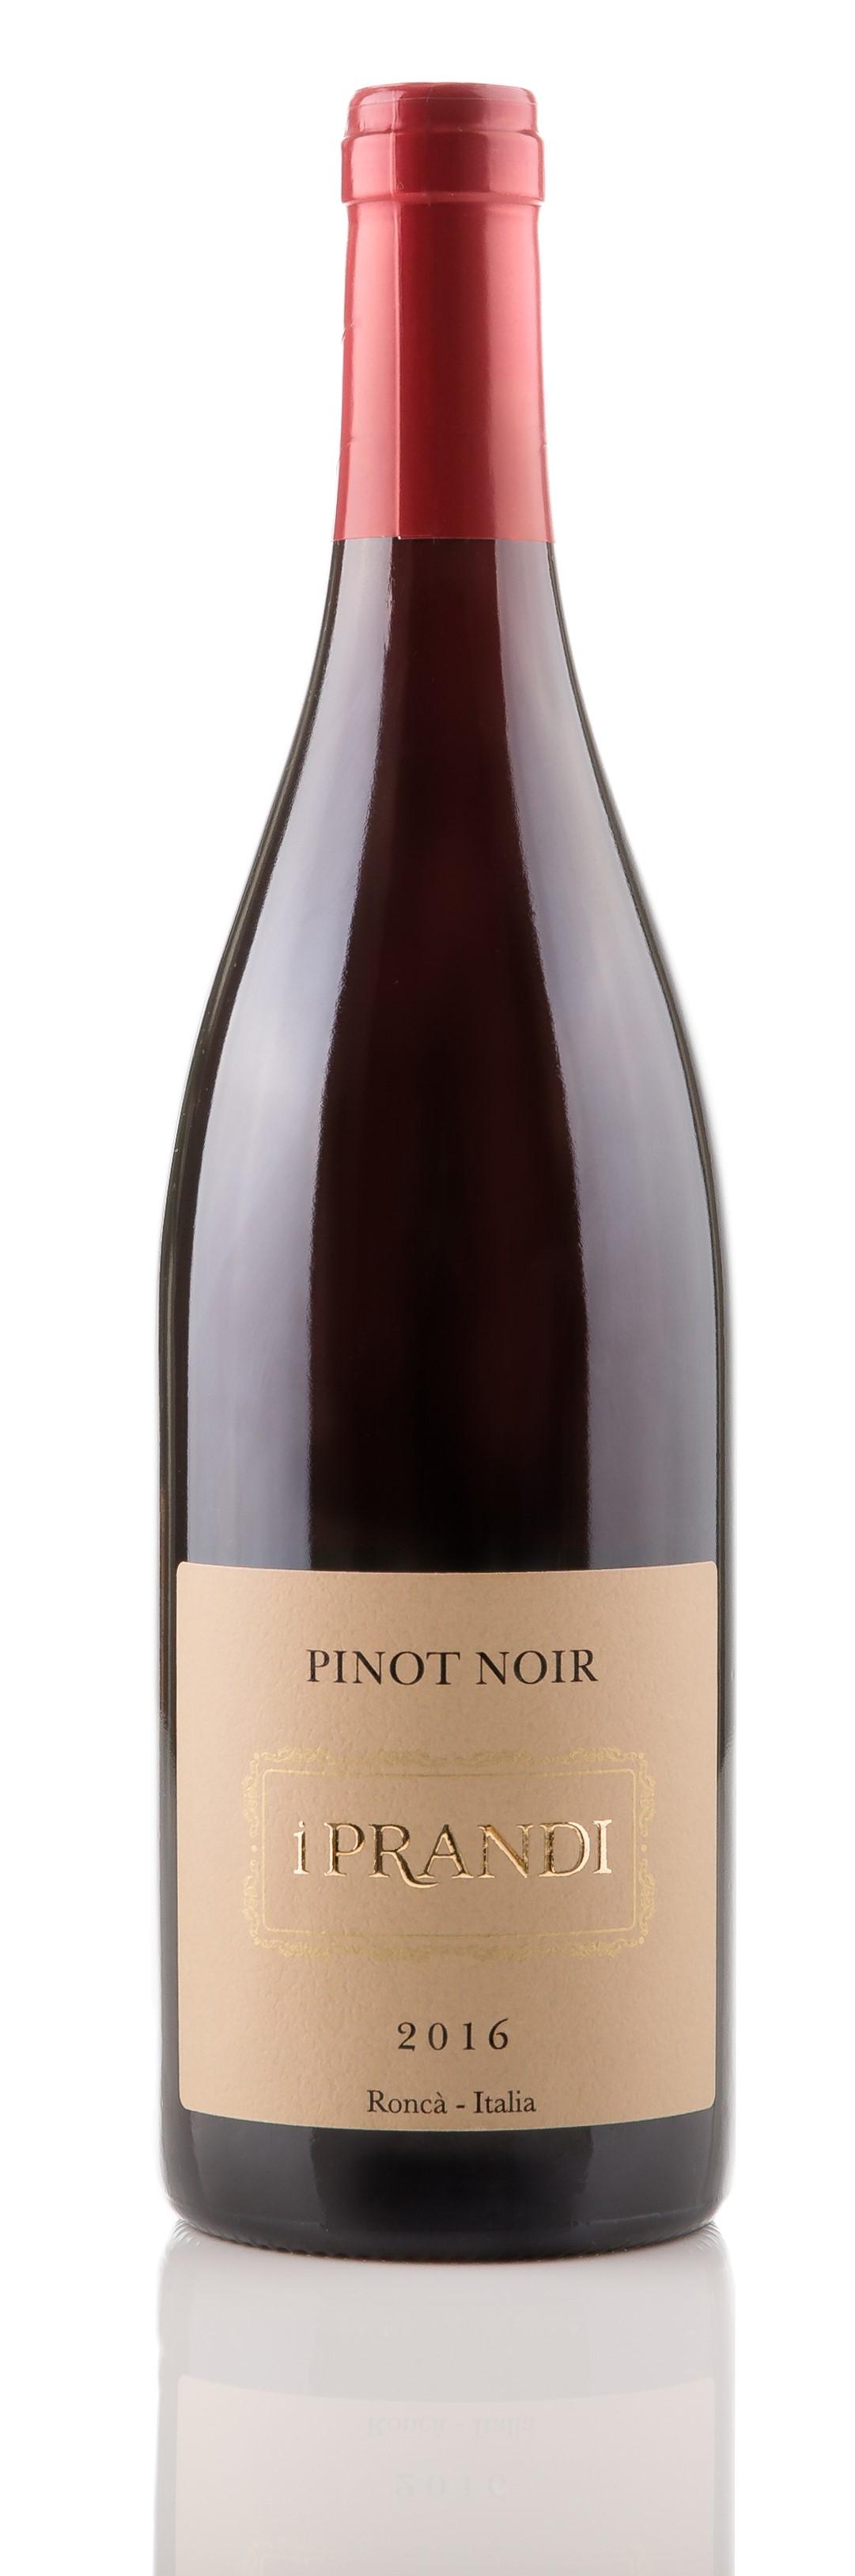 I Prandi Pinot Noir IGT